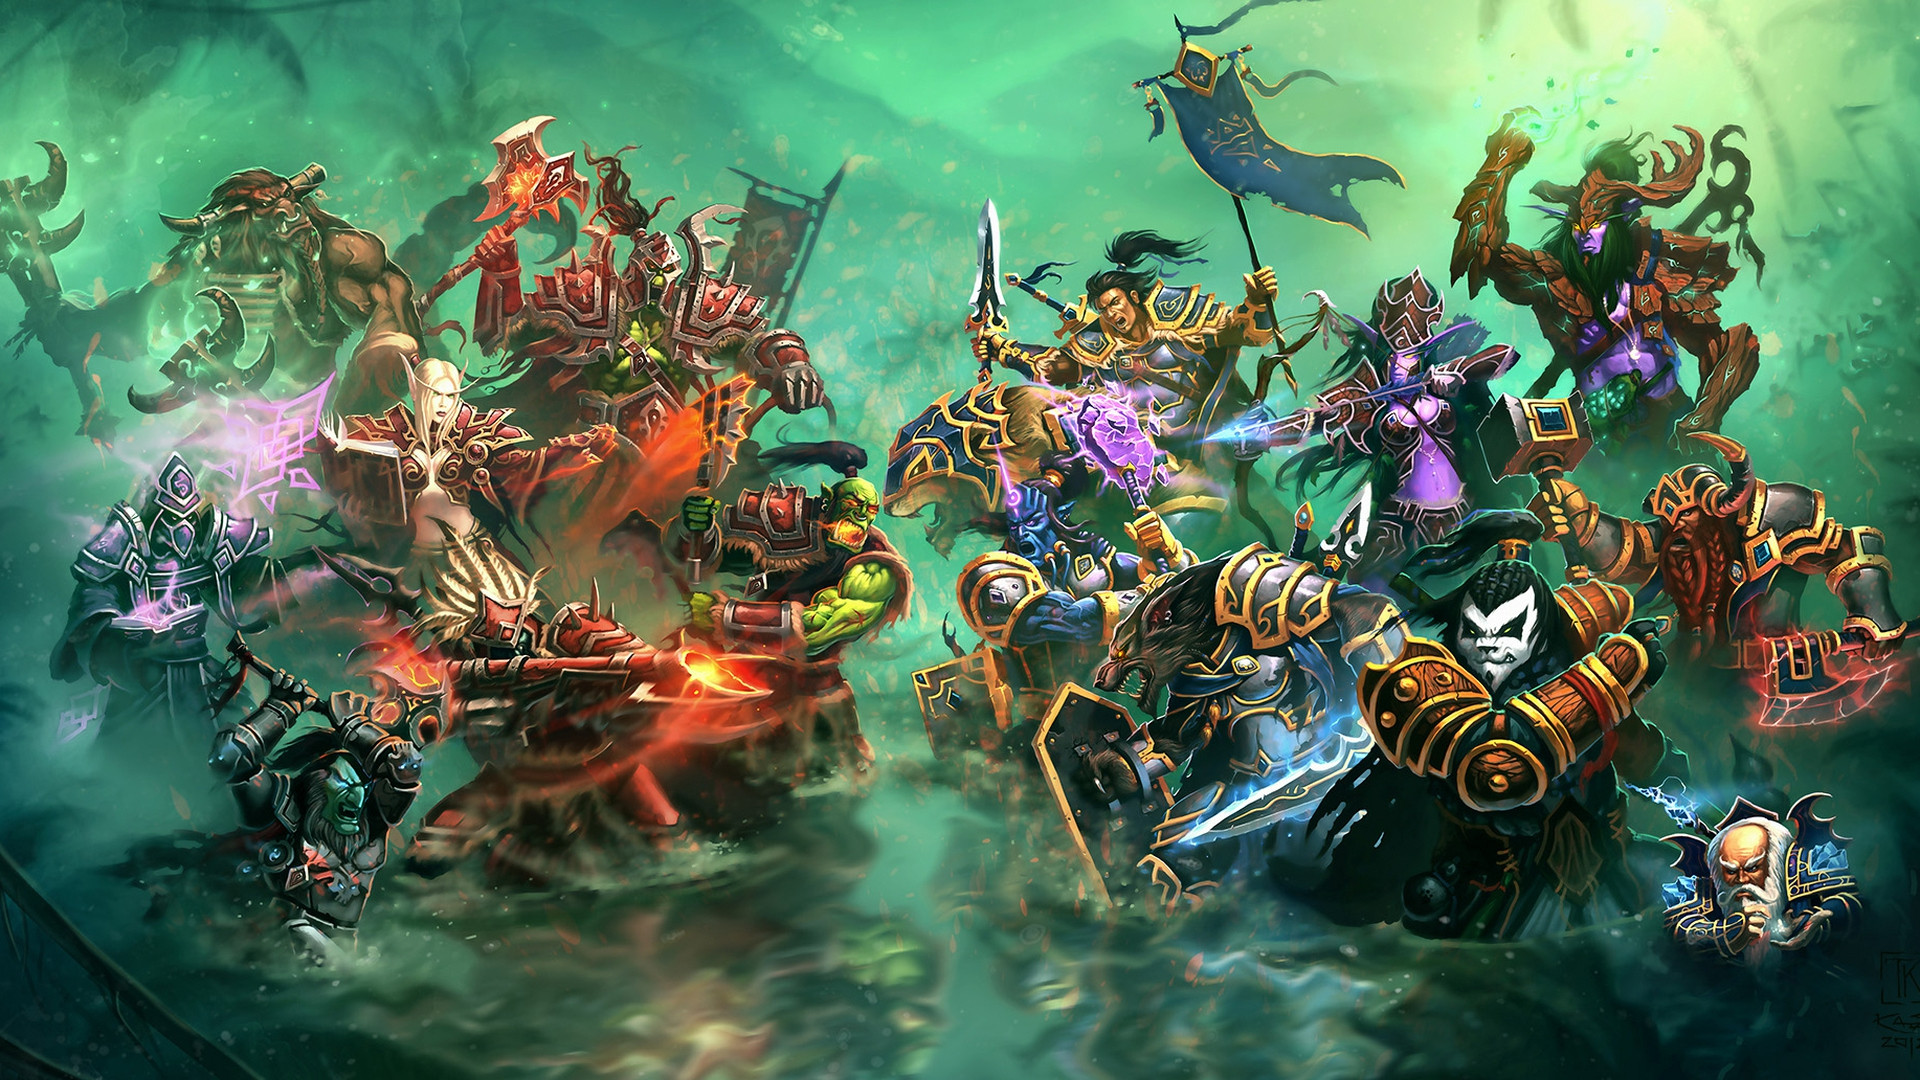 World Of Warcraft Backgrounds 1920x1080: Horde Wallpaper HD (68+ Images